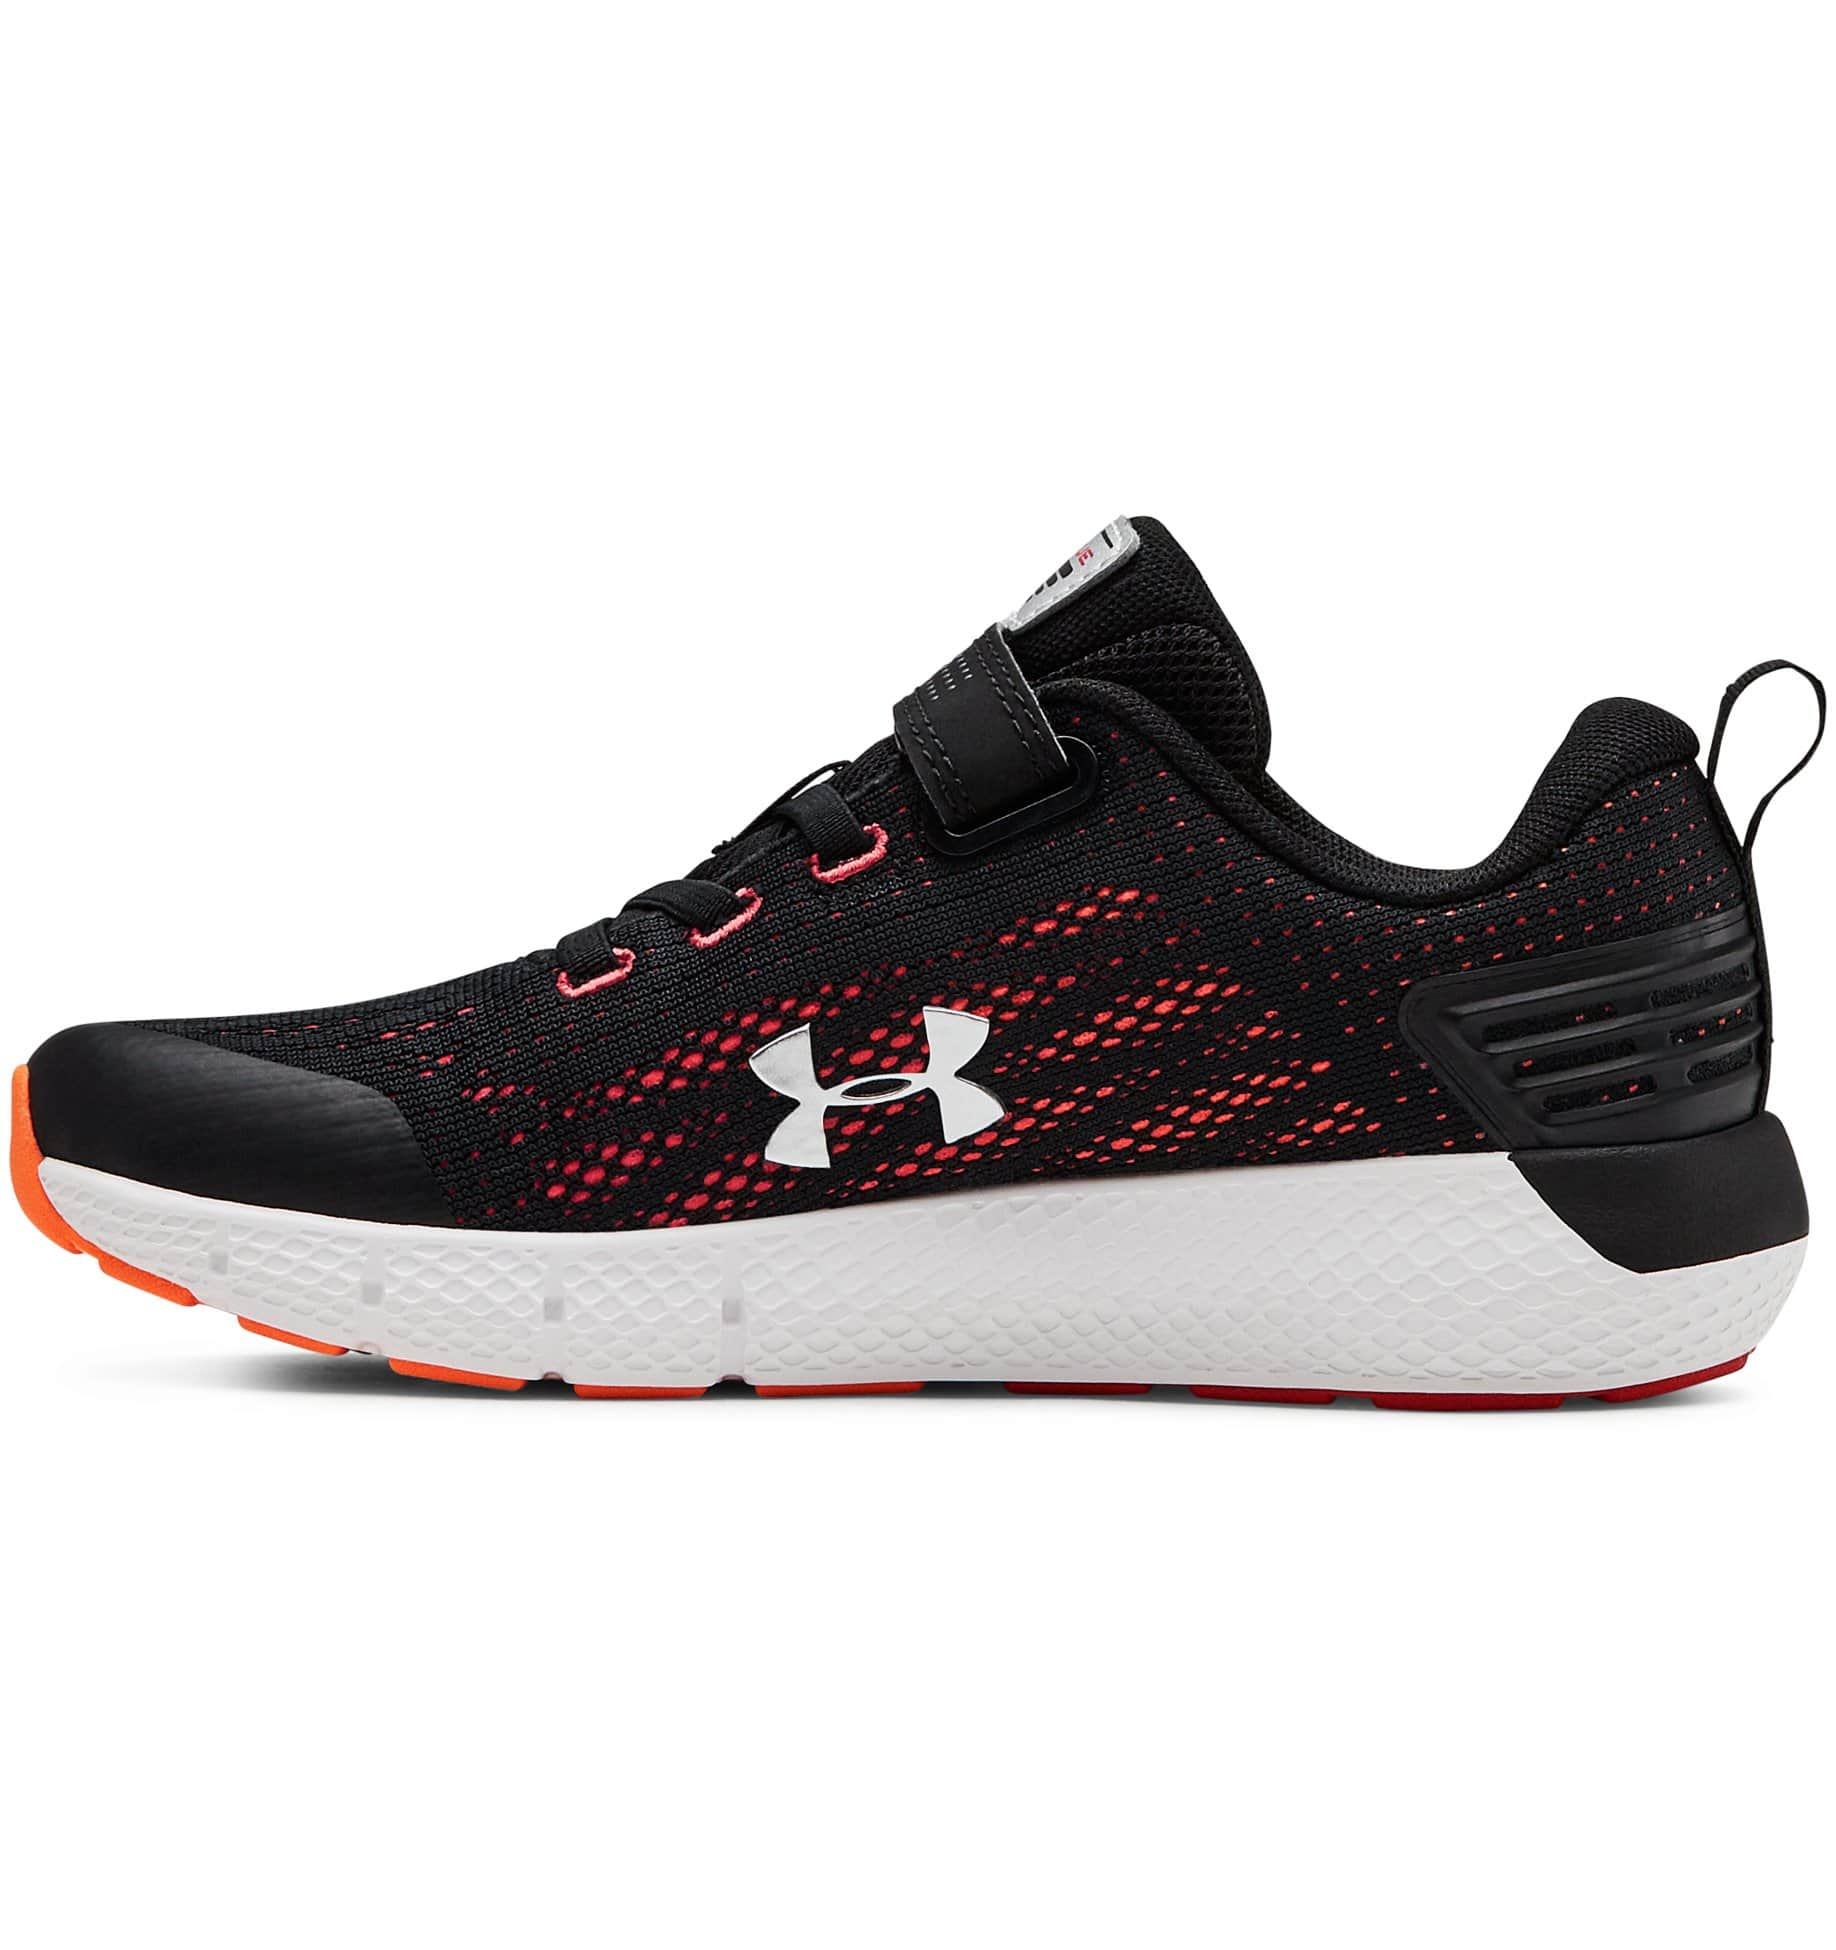 Boys' Pre-School UA Rogue AC Running Shoes (5 Colors) $35.69 + fs